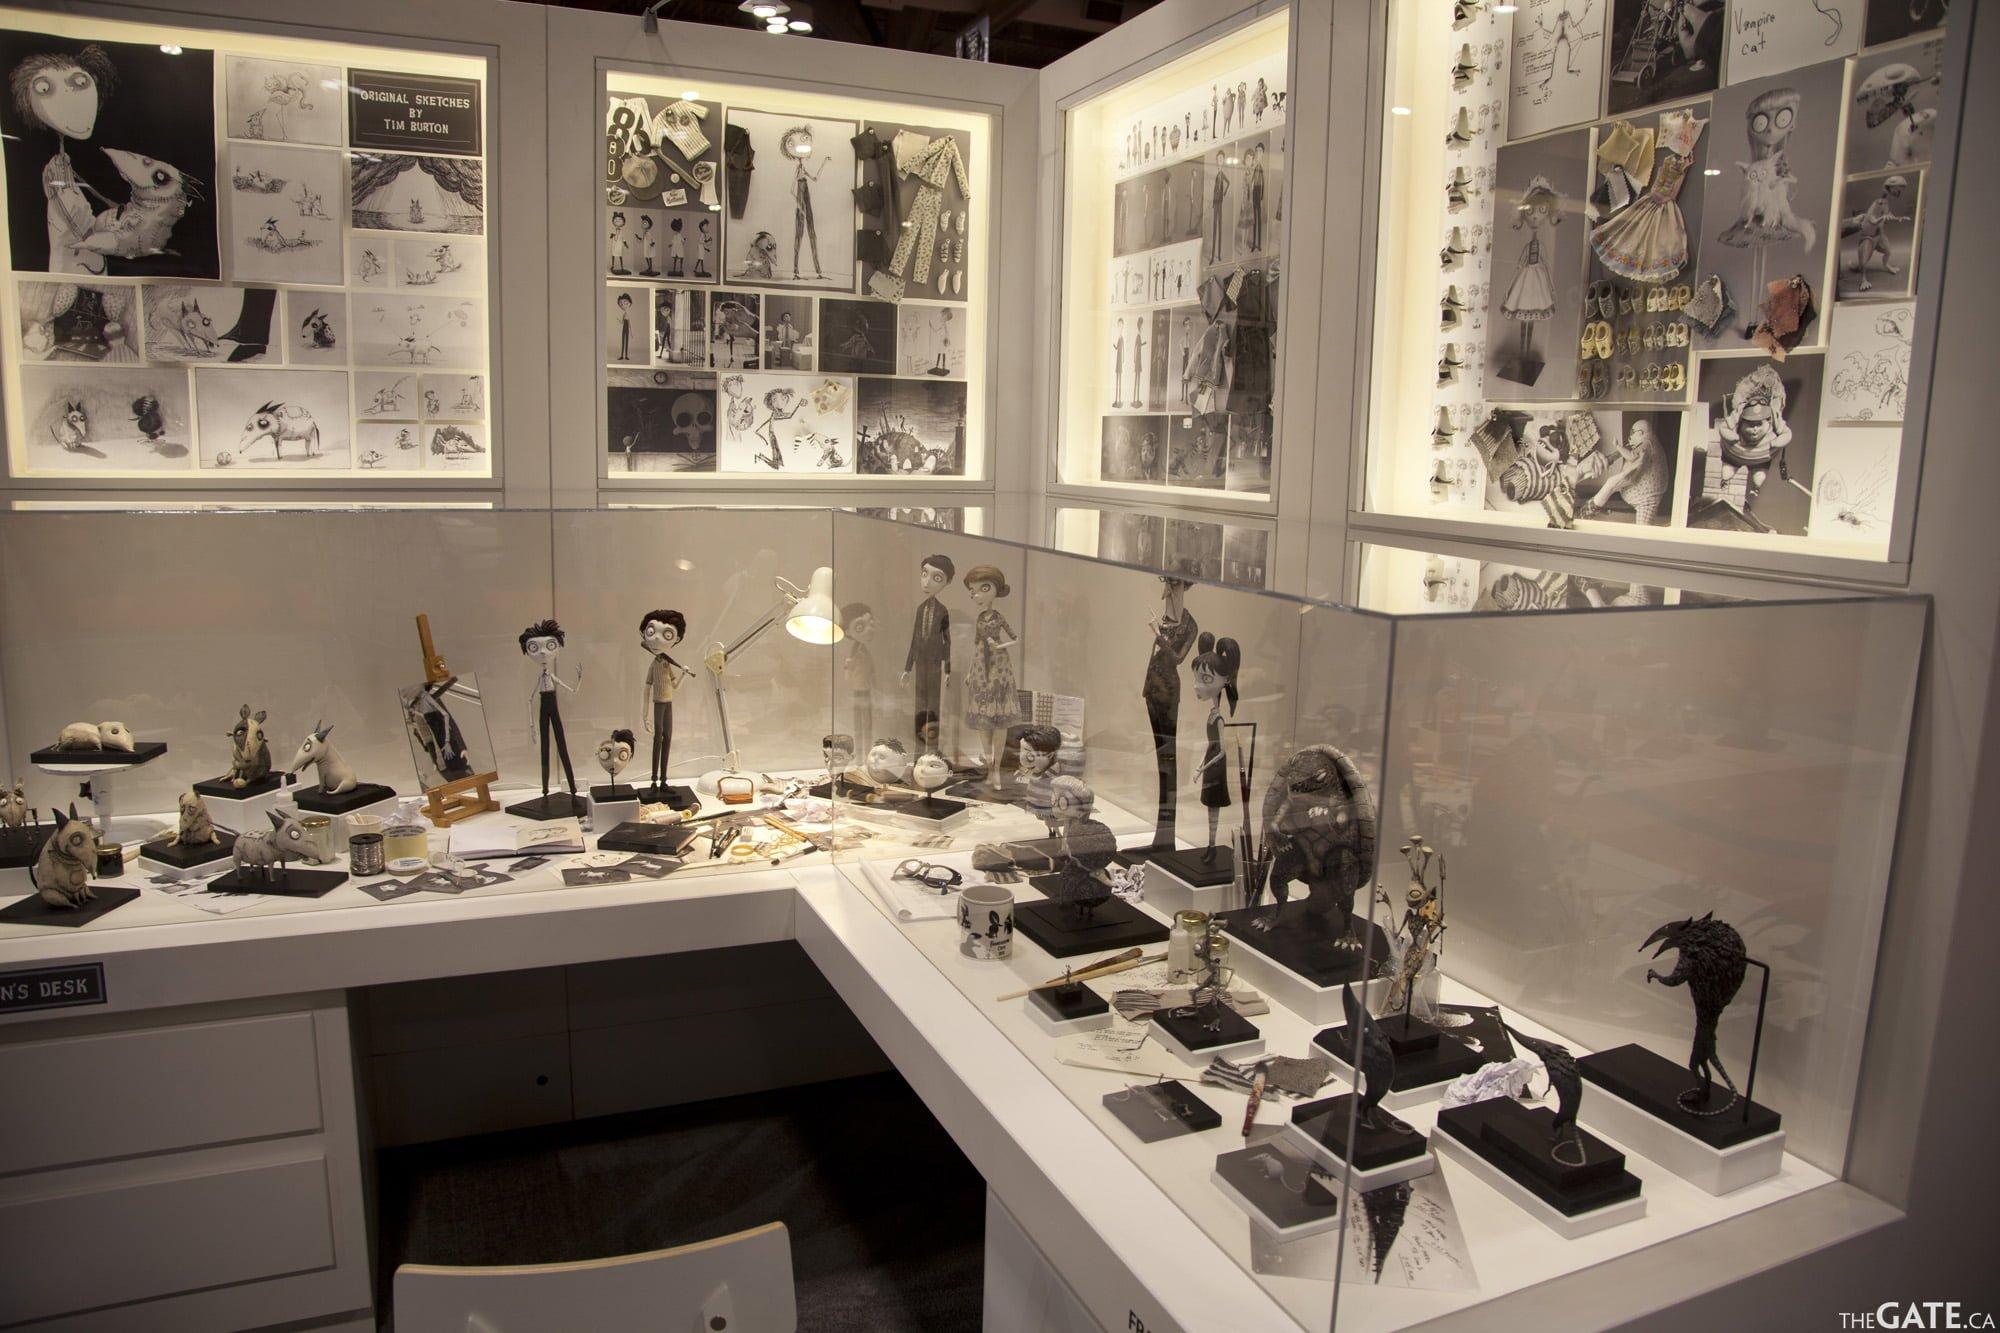 Tim Burton's desk replica